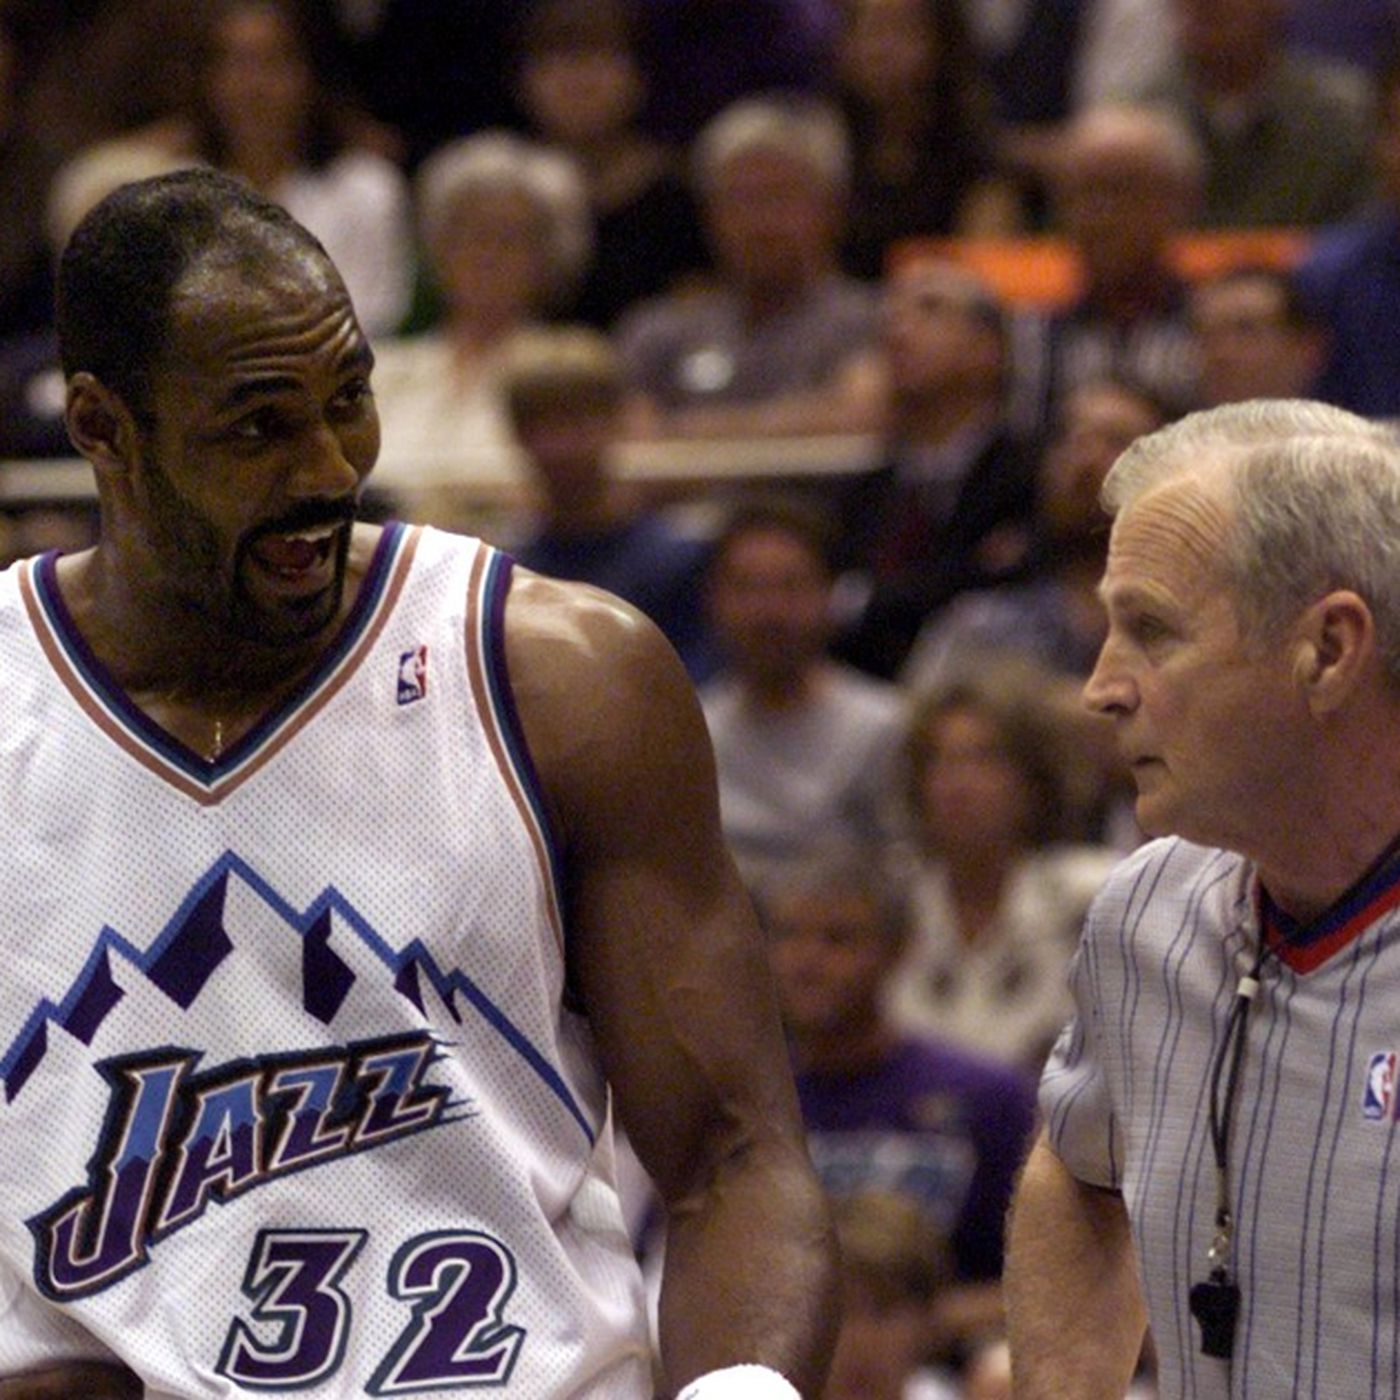 big sale 59f83 0ce62 Morning links: Shaq sticks up for Utah Jazz; Robert Whaley's ...